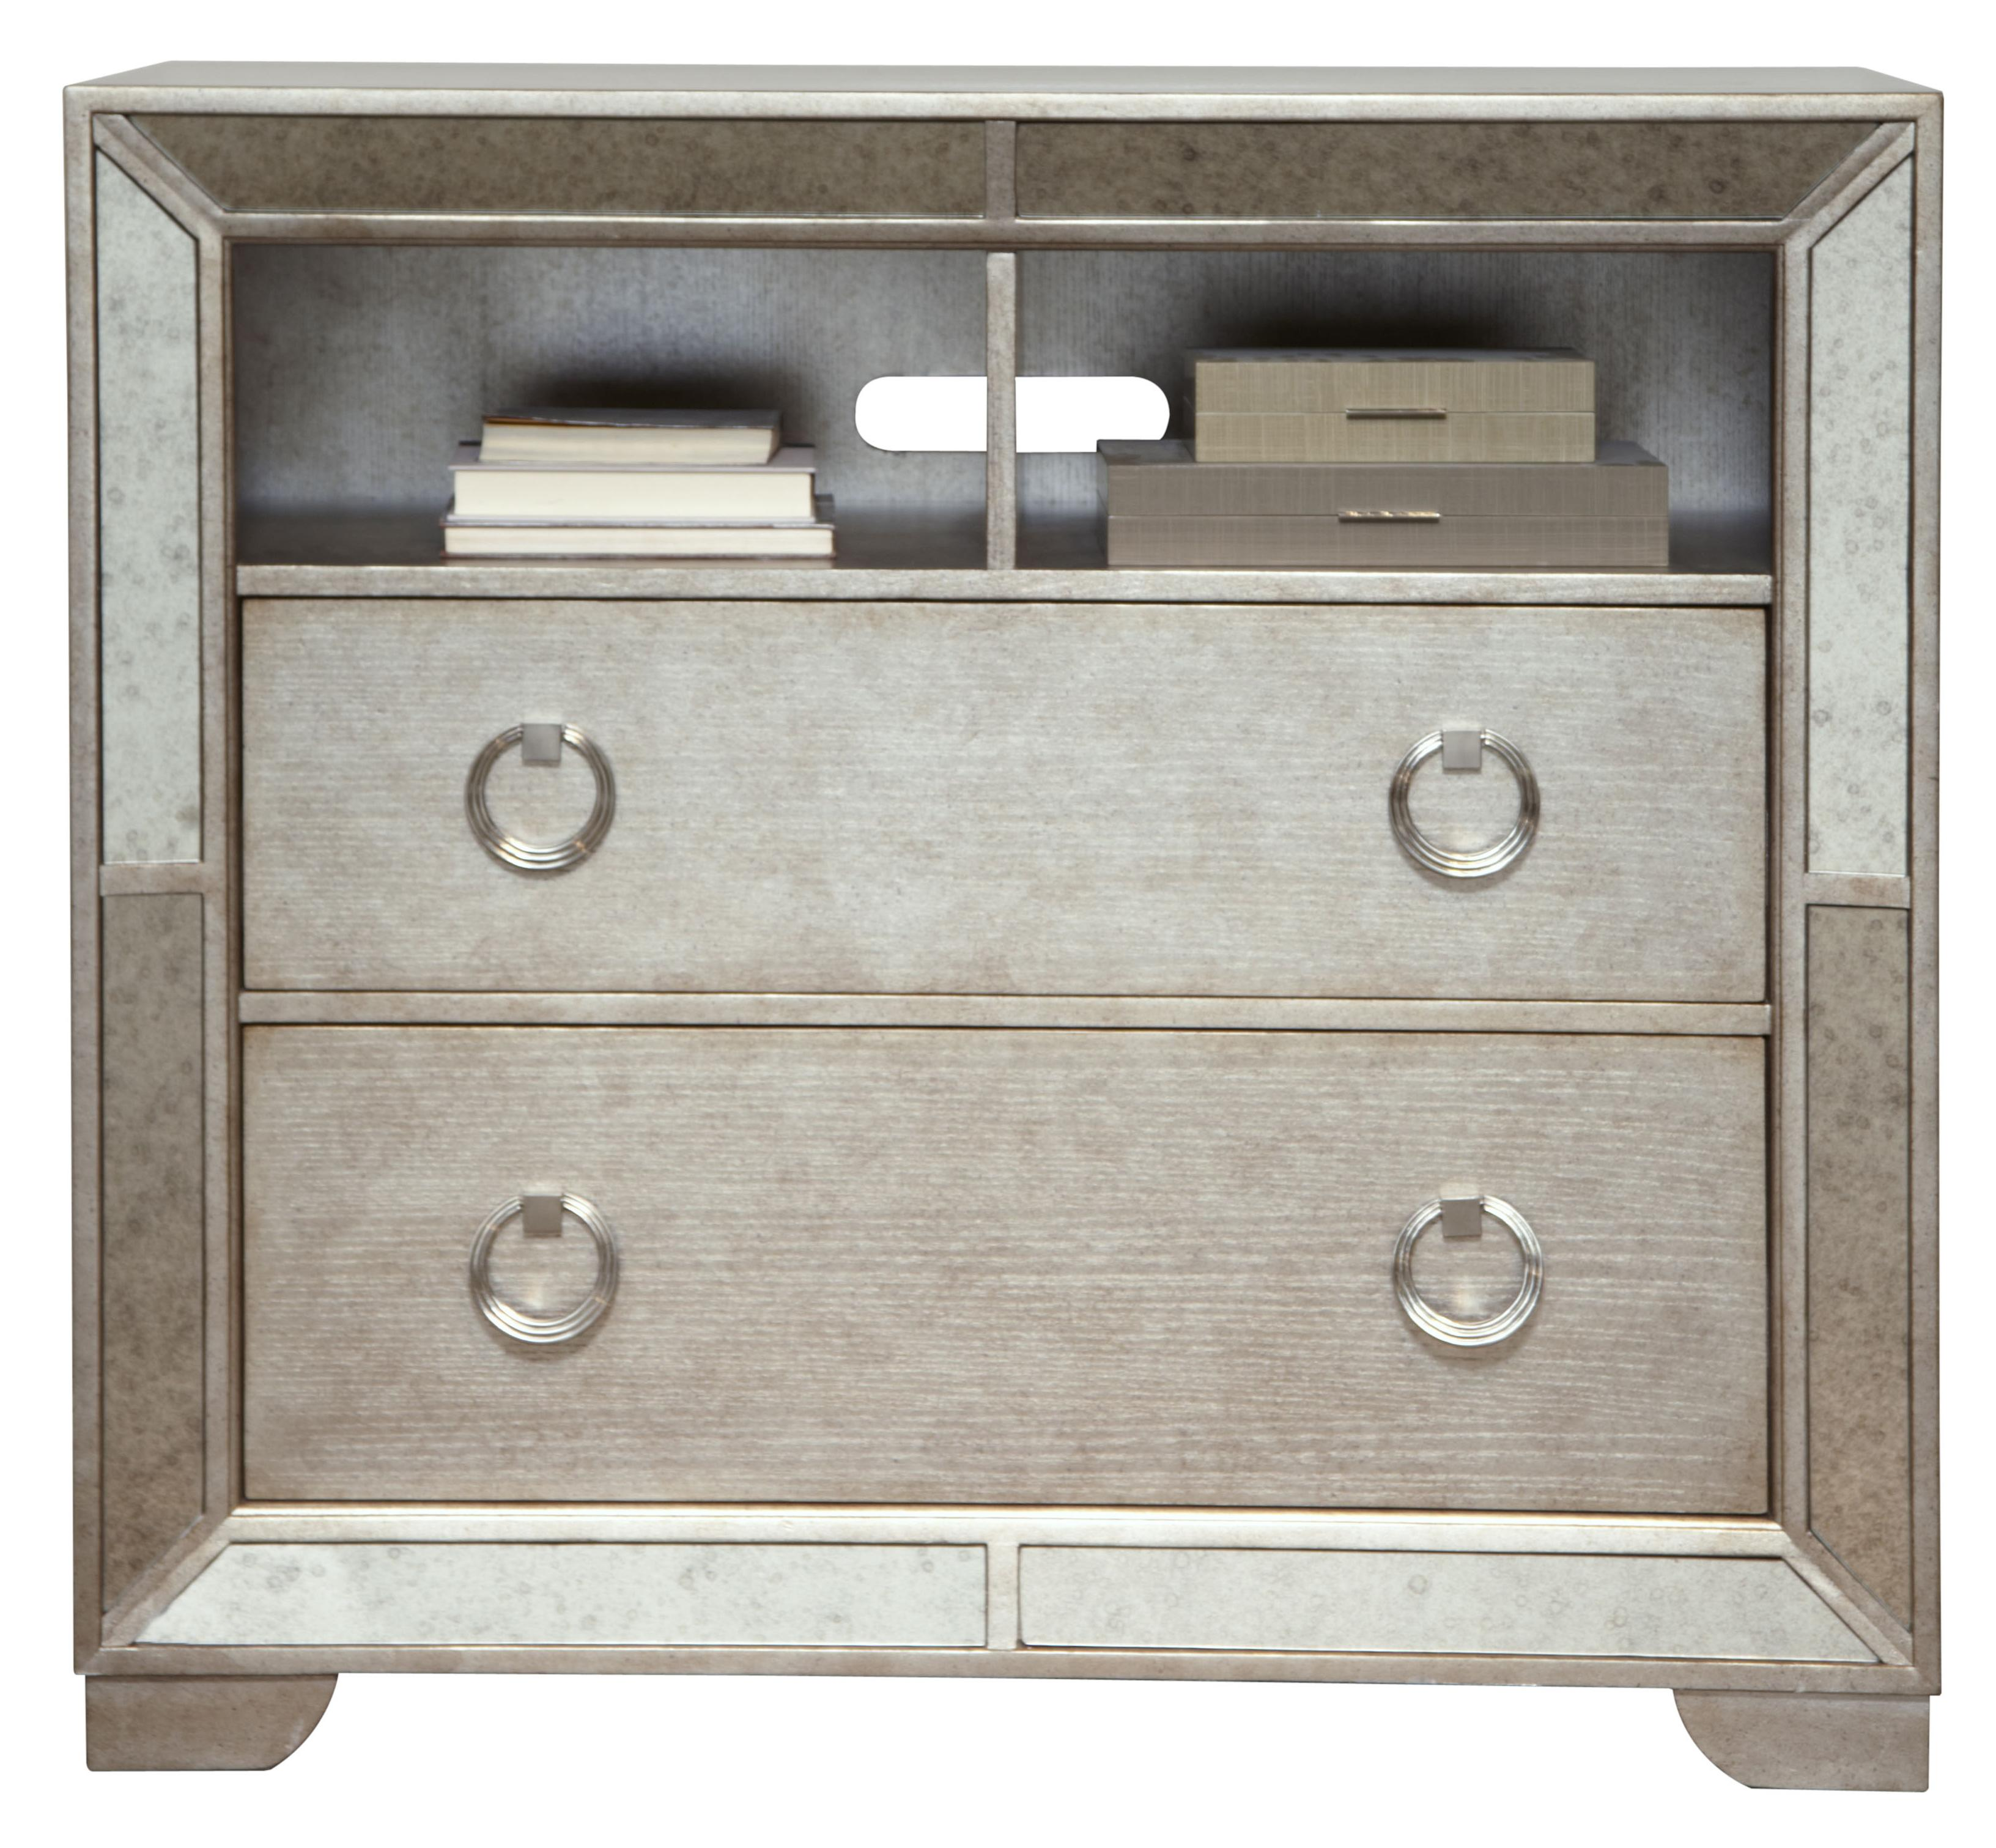 Farrah Media Chest W/ Open Shelving U0026 Drawers By Pulaski Furniture